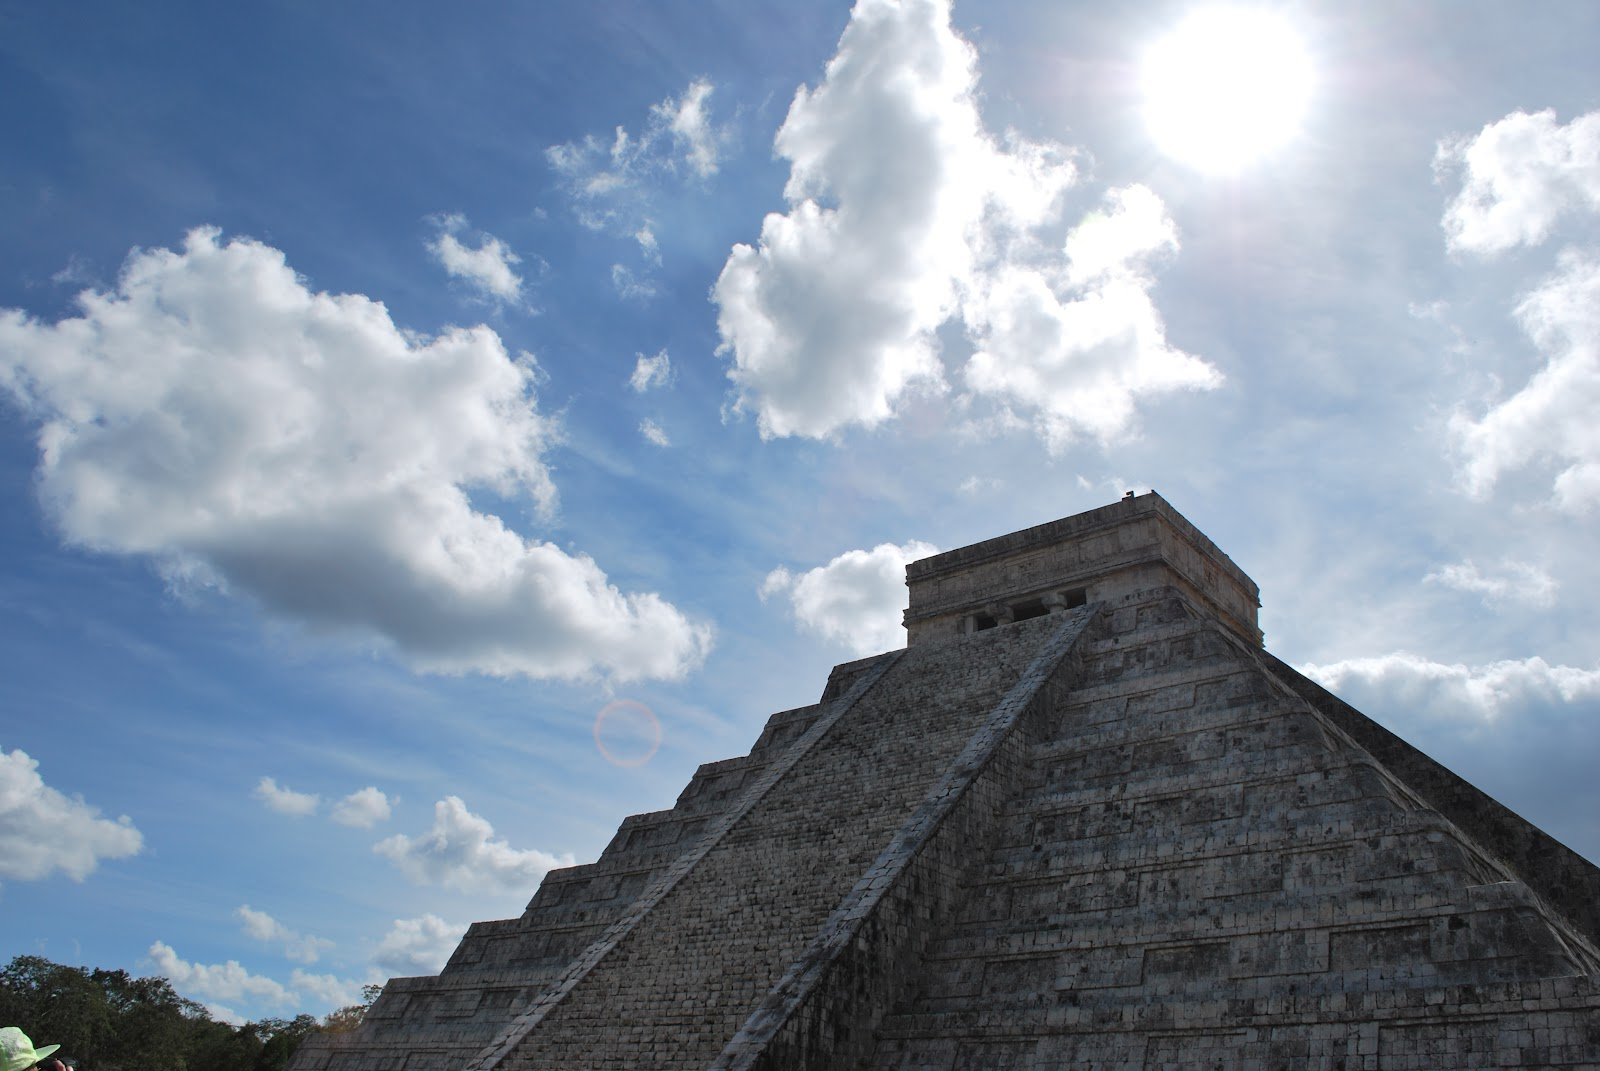 http://3.bp.blogspot.com/-orBoxX2RQB8/T_AEa1-oLkI/AAAAAAAAApE/eButuAZeT4I/s1600/architecture_photography_buildings_mexico_archeology_pyramids_mayan_desktop_3872x2592_hd-wallpaper-506322.jpg